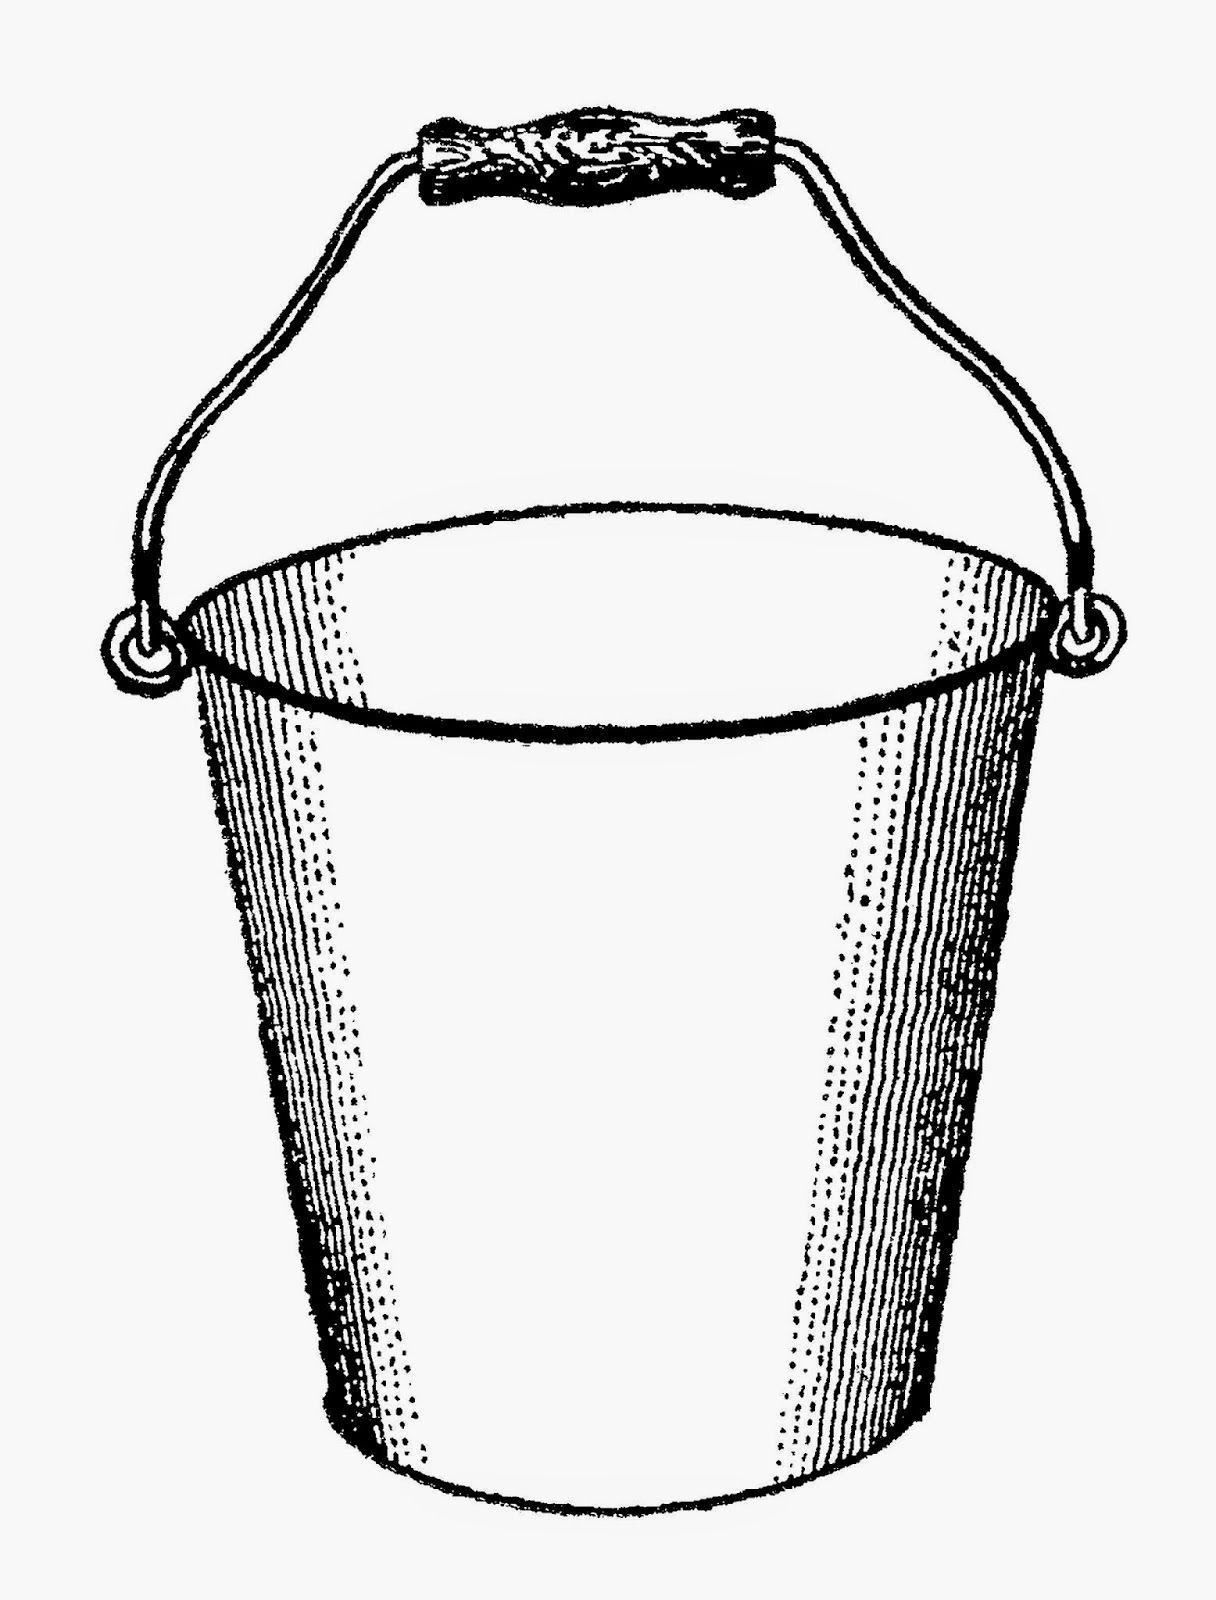 Antique Images Free Printable Digital Transfer Of Gardening Clip Art Water Bucket